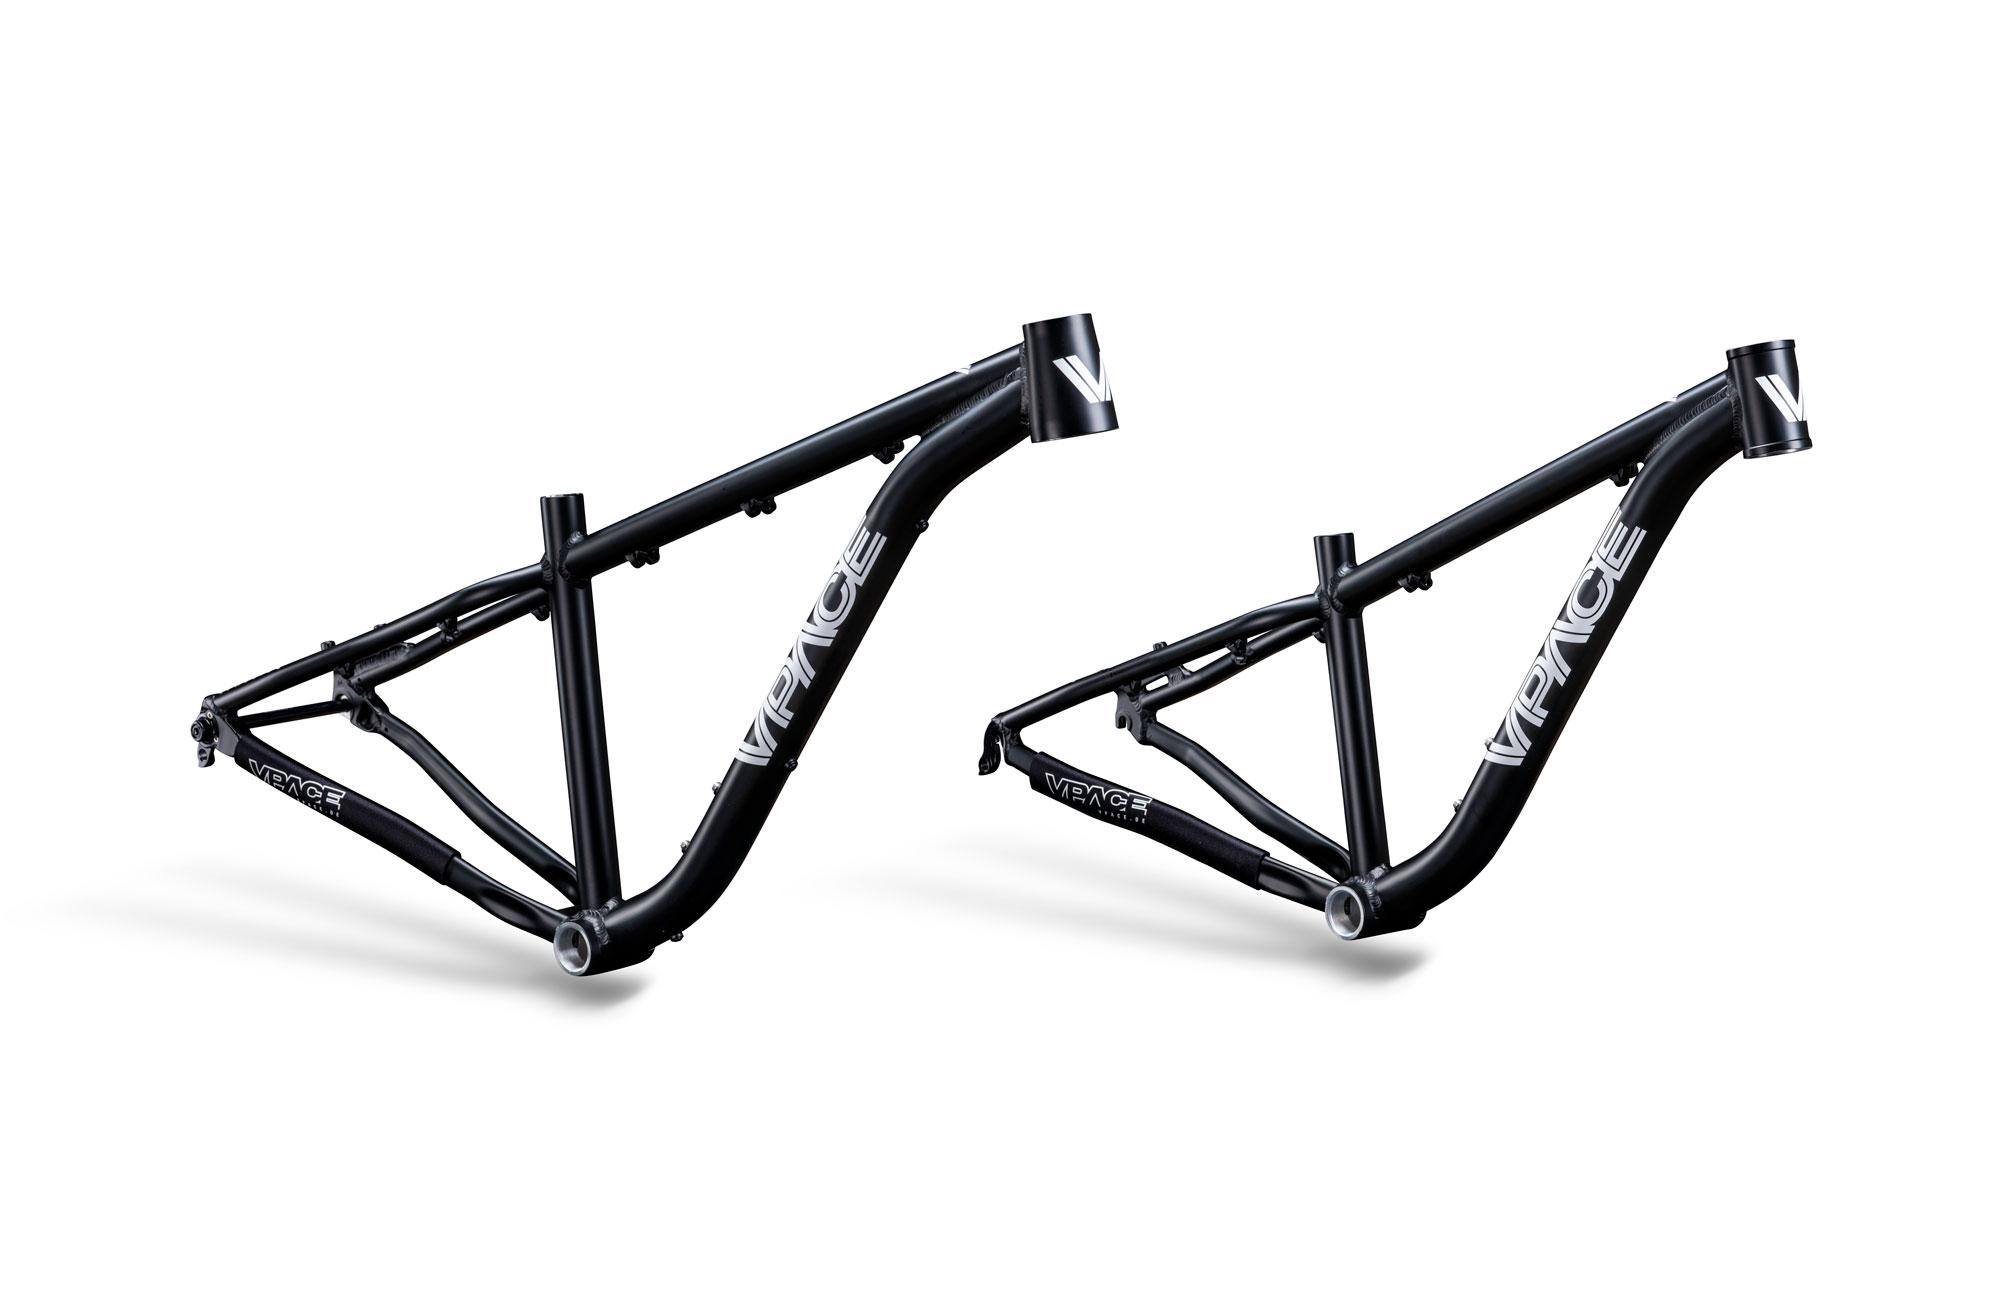 27,5 Zoll Mountainbike Fahrradrahmen BSA Vollcarbon MTB Fahrradrahmen Rahmenset